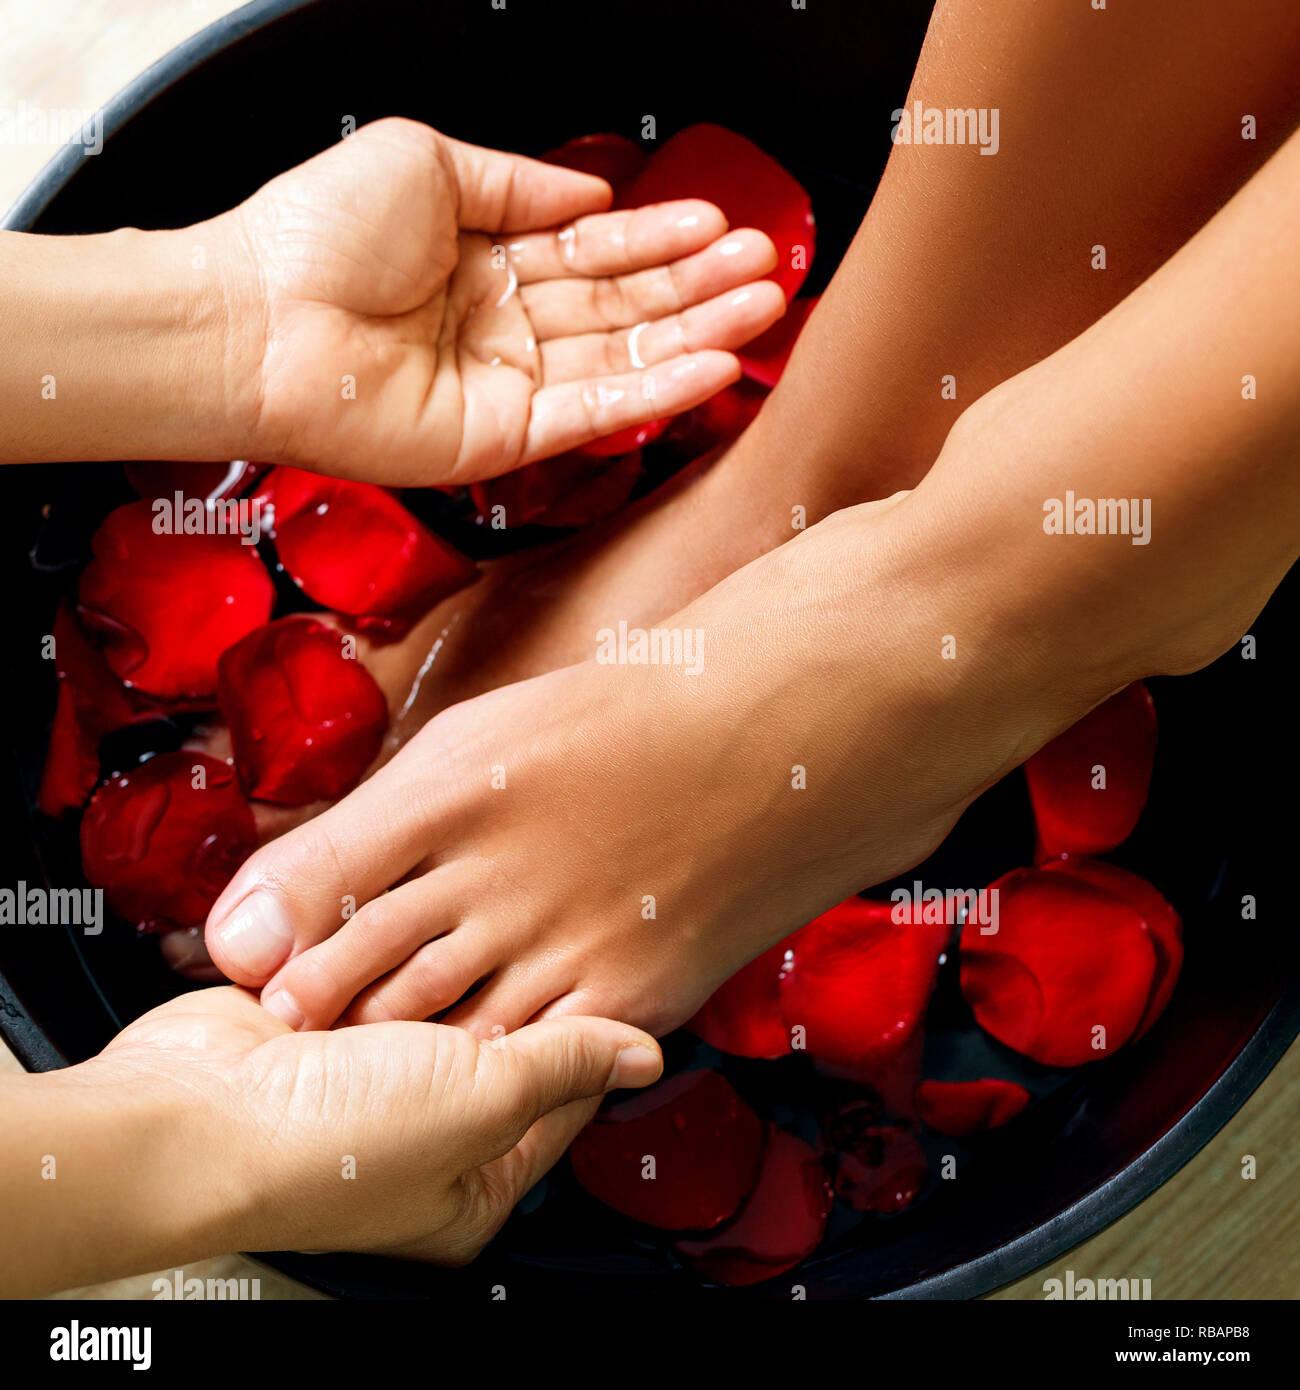 Baby Foot De Salon foot washing in the spa salon. legs massage concept. feet